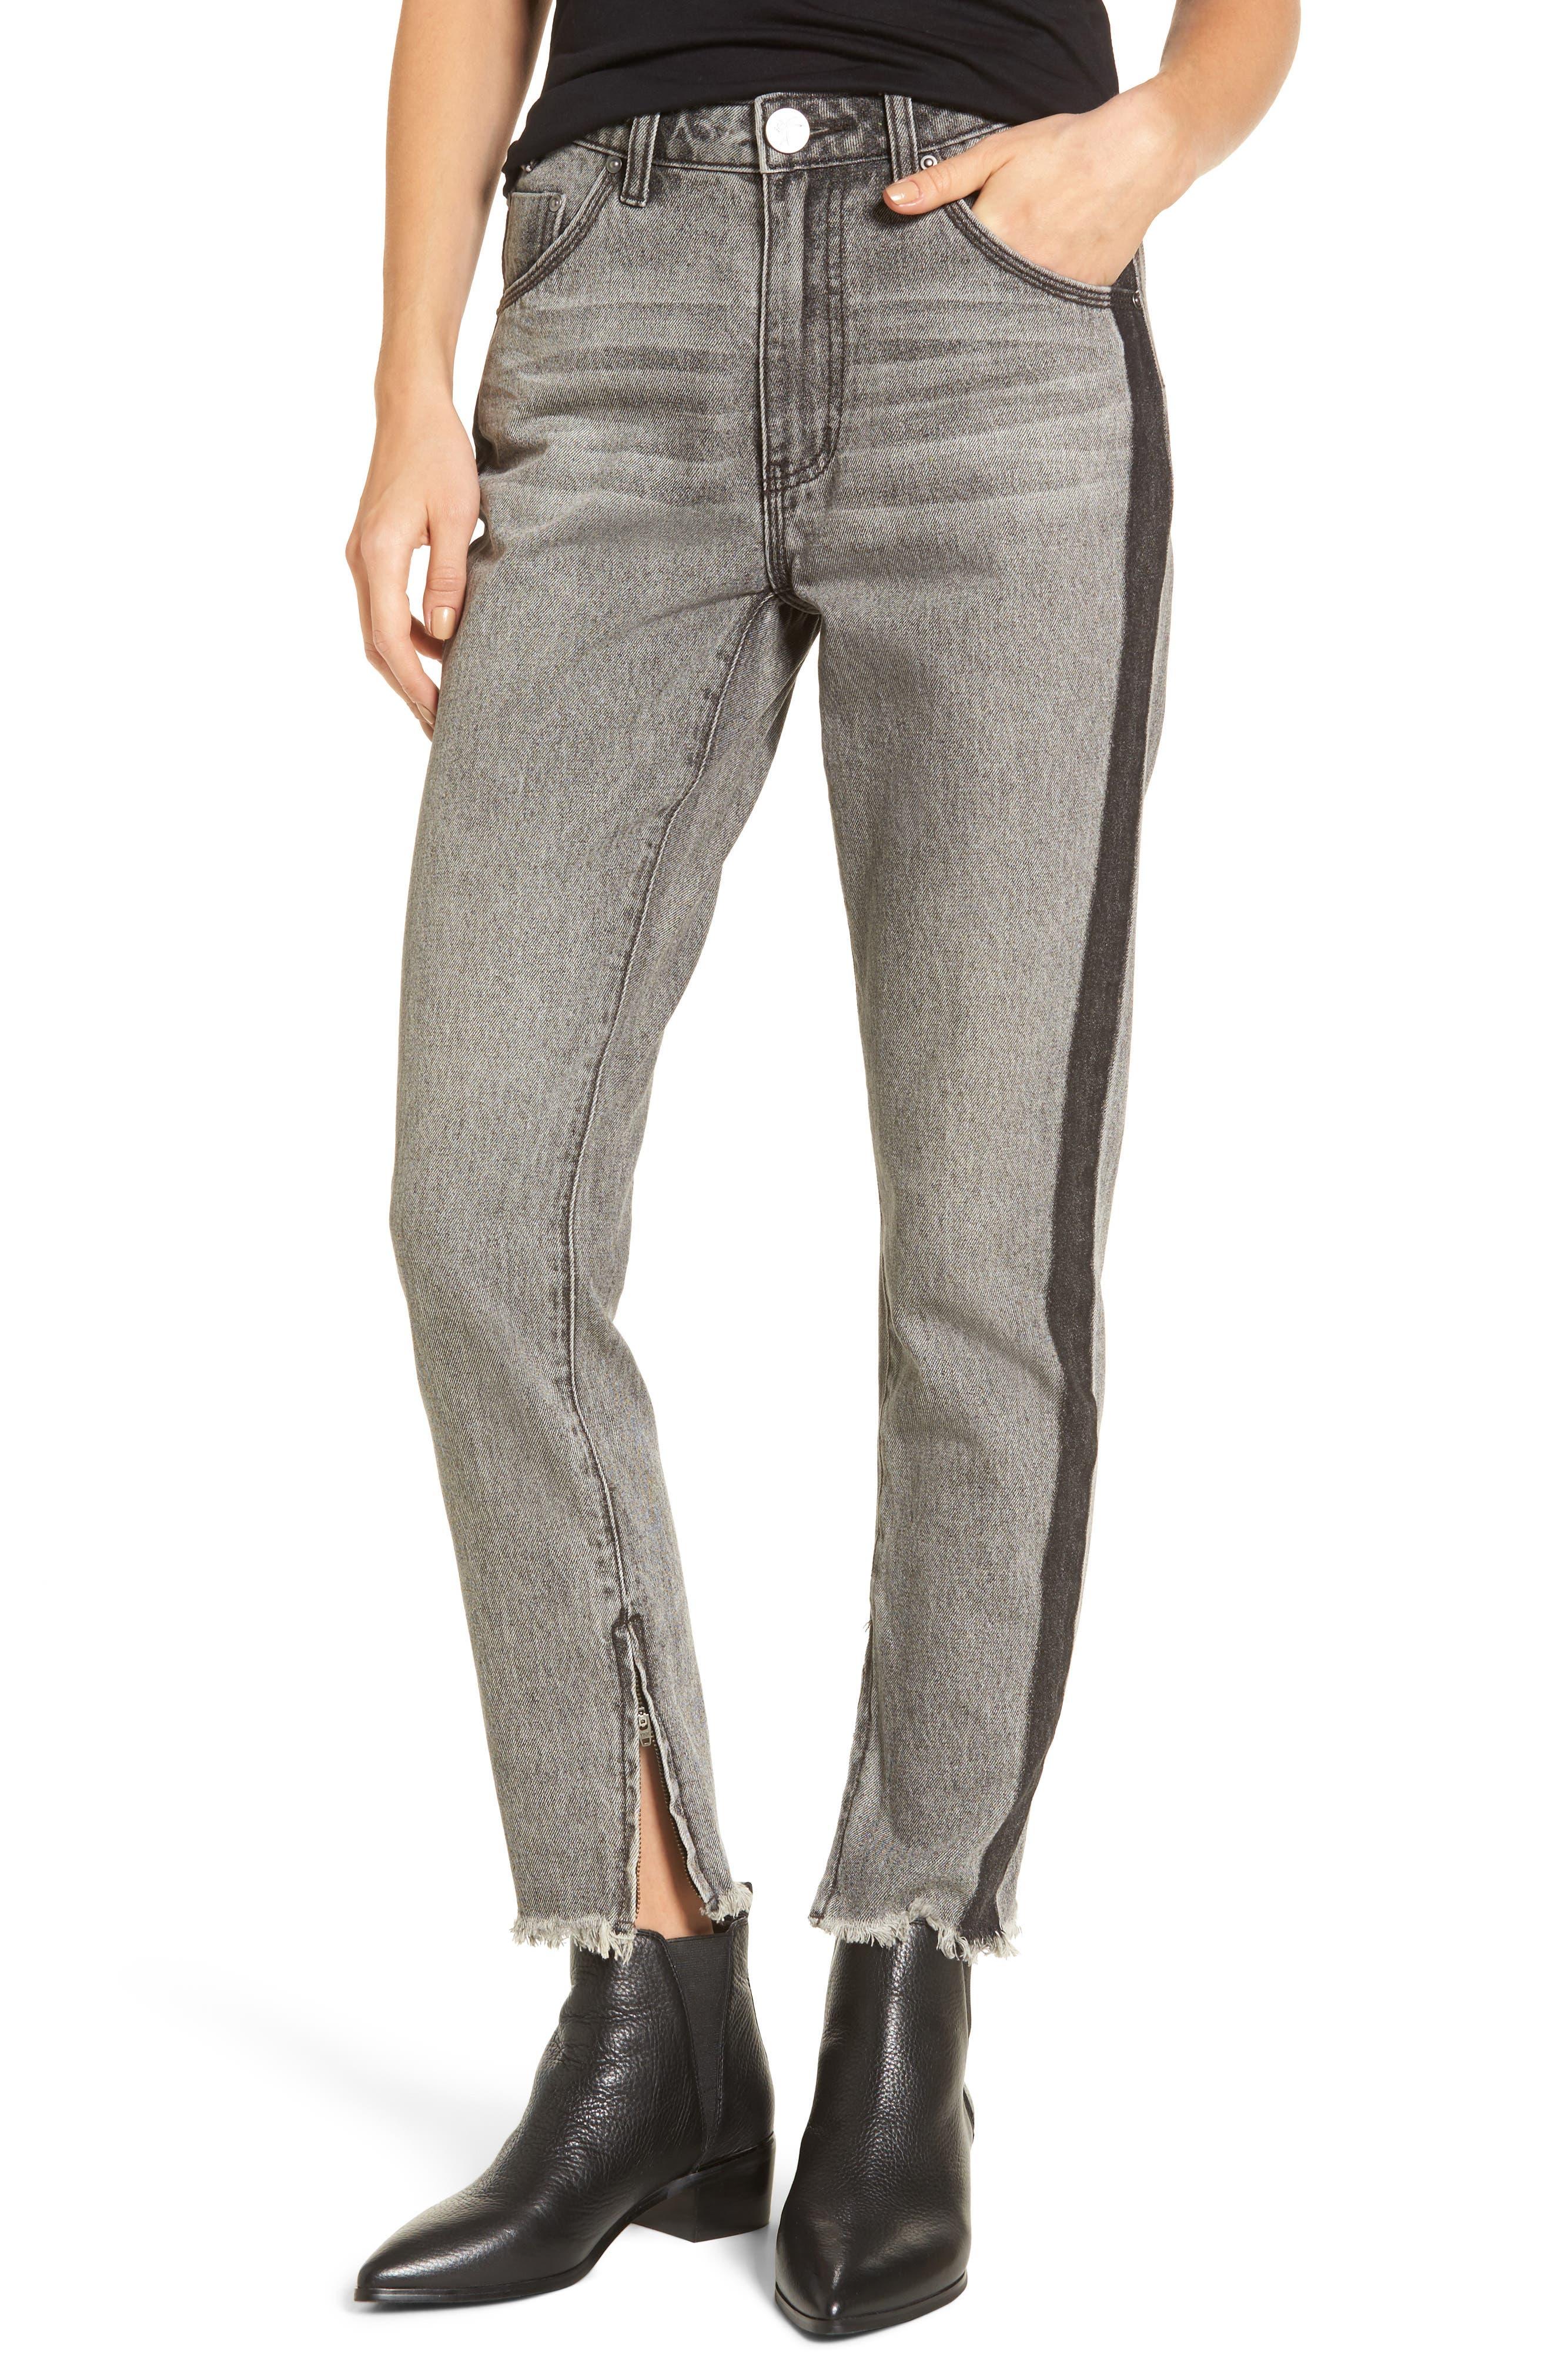 Freebirds High Waist Skinny Jeans,                             Main thumbnail 1, color,                             Camden